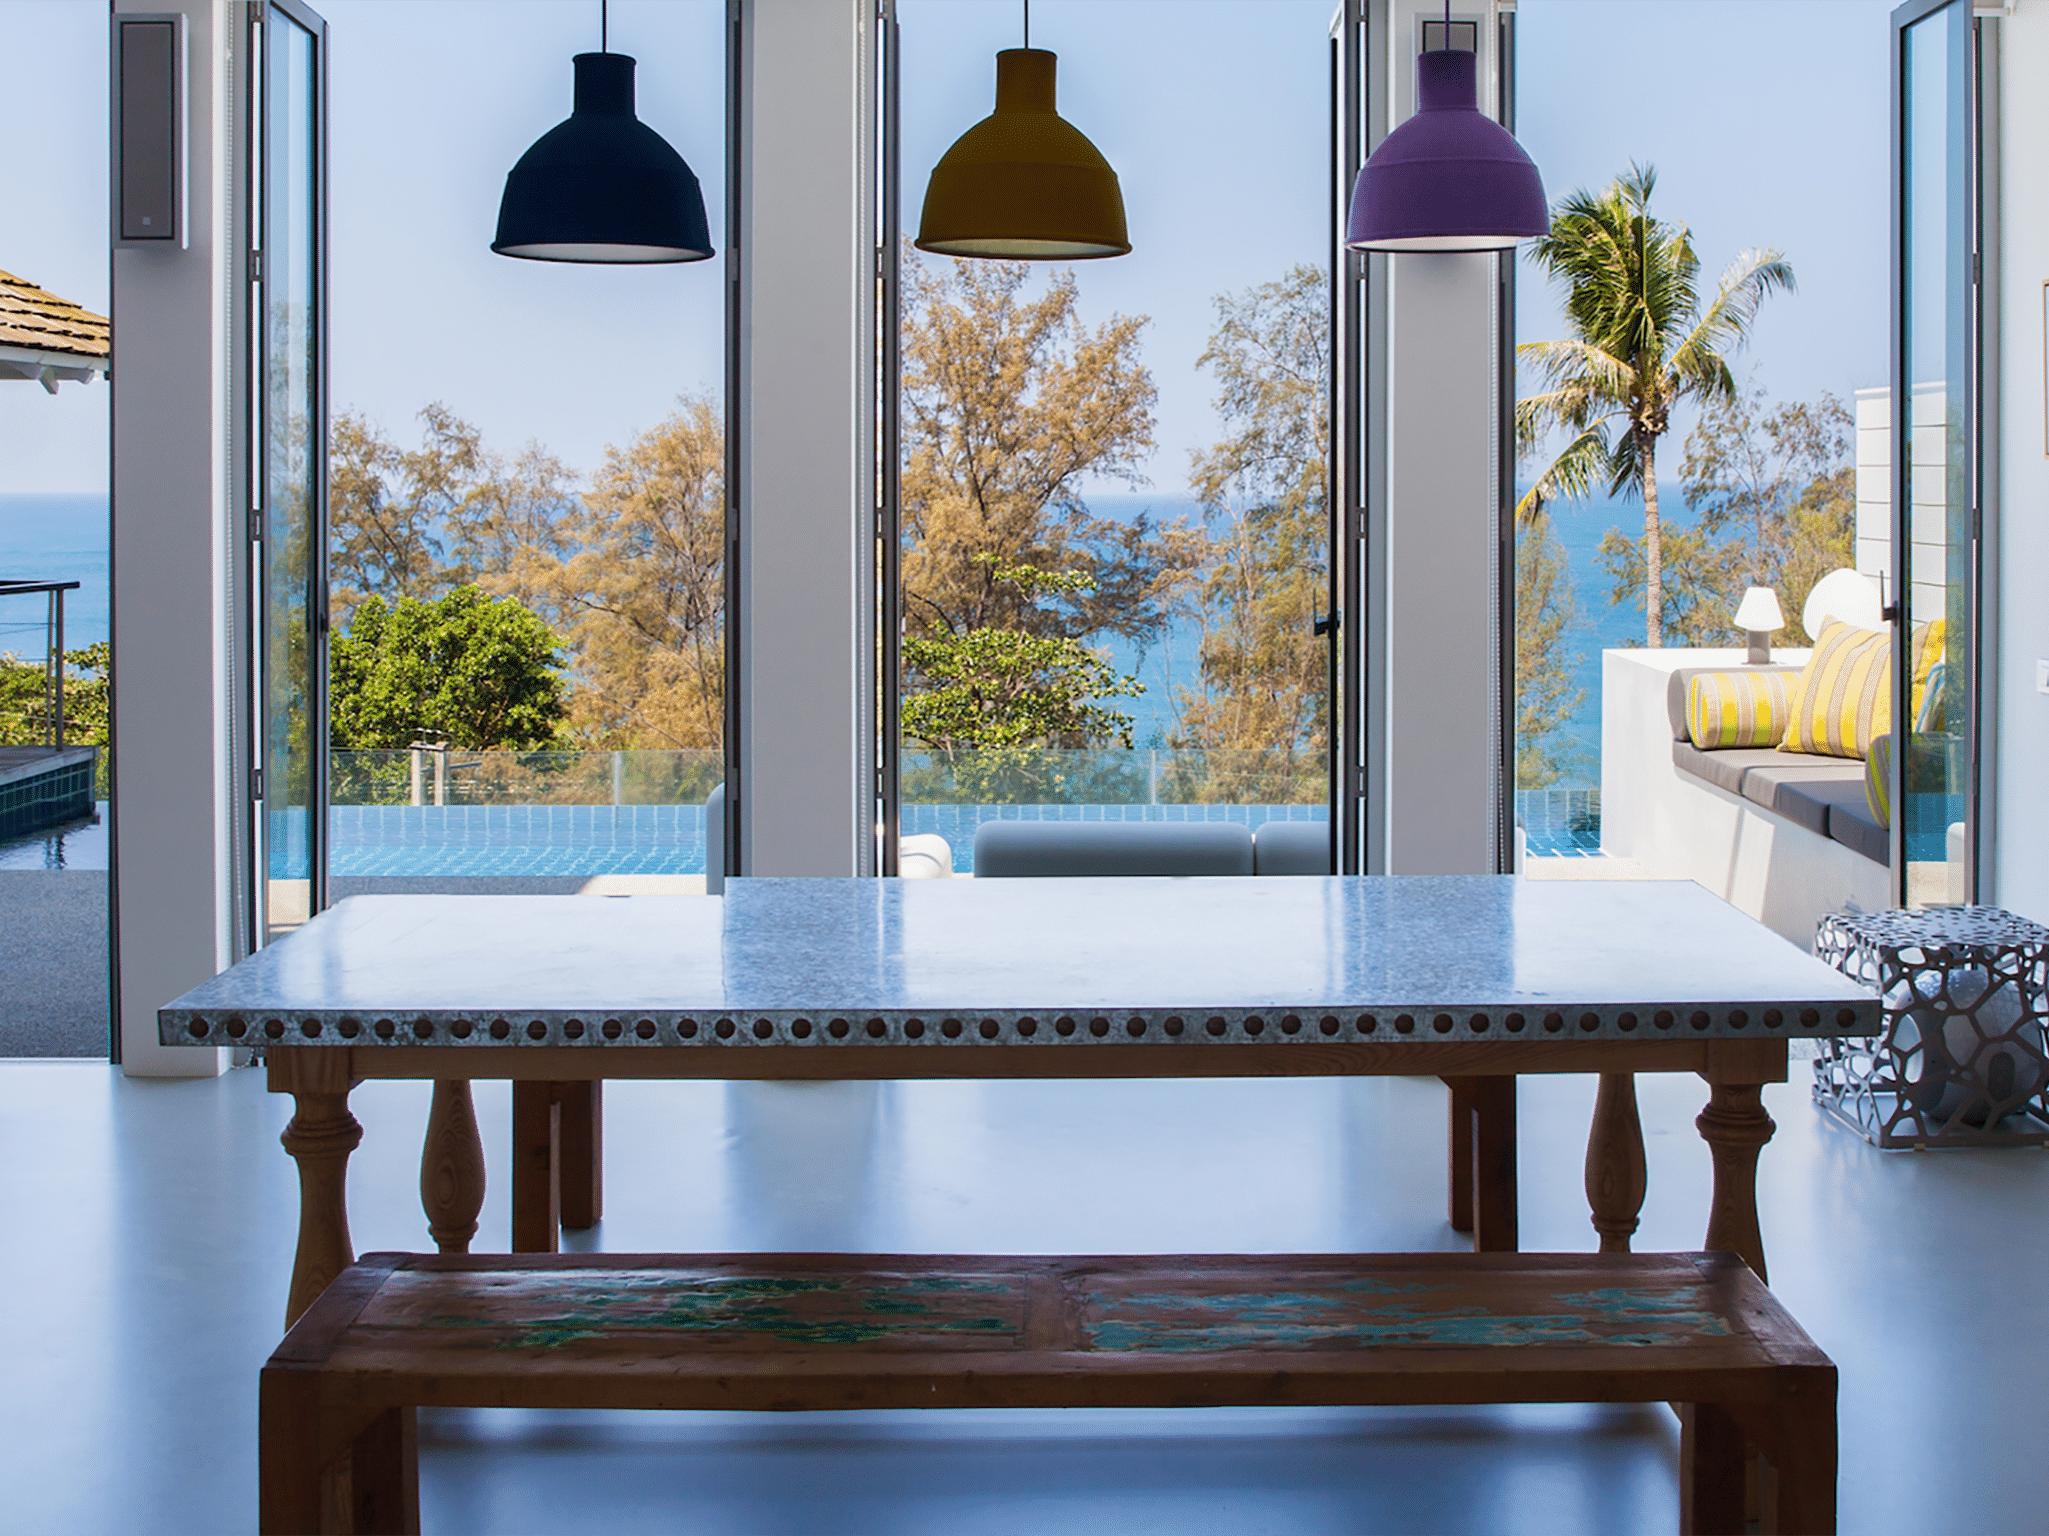 Villa Sammasan - Dining area with a view